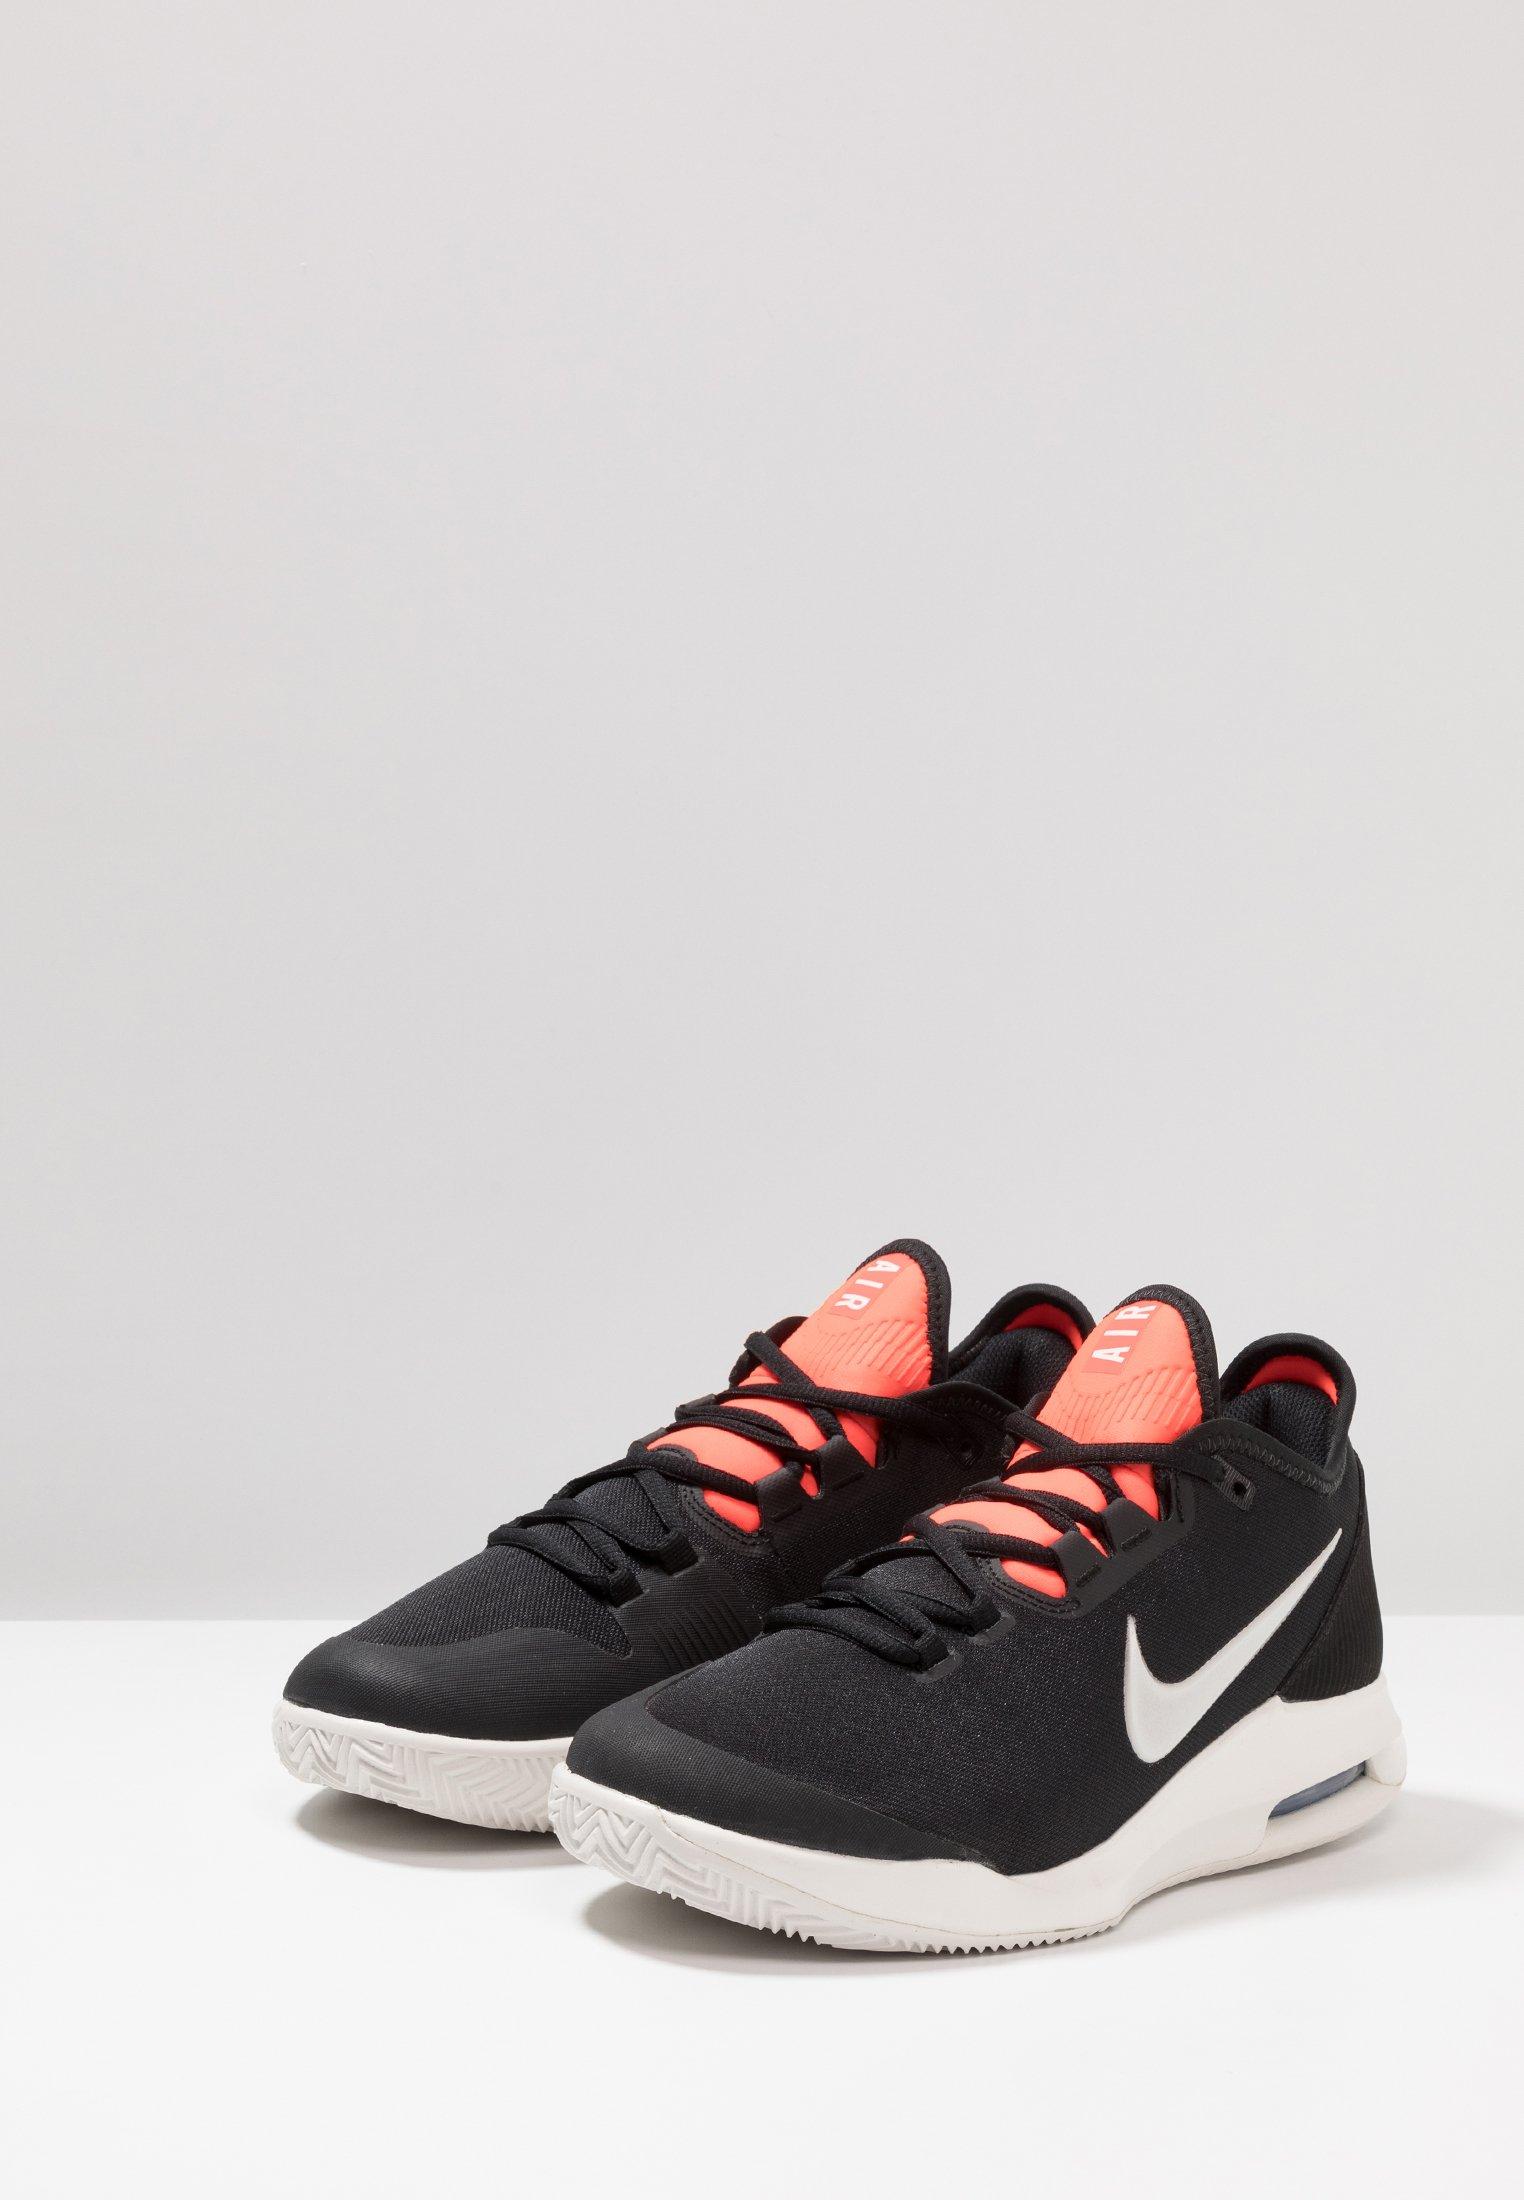 COURT AIR MAX WILDCARD CLAY Chaussures de tennis pour terre battueerre battue blackphantombright crimson